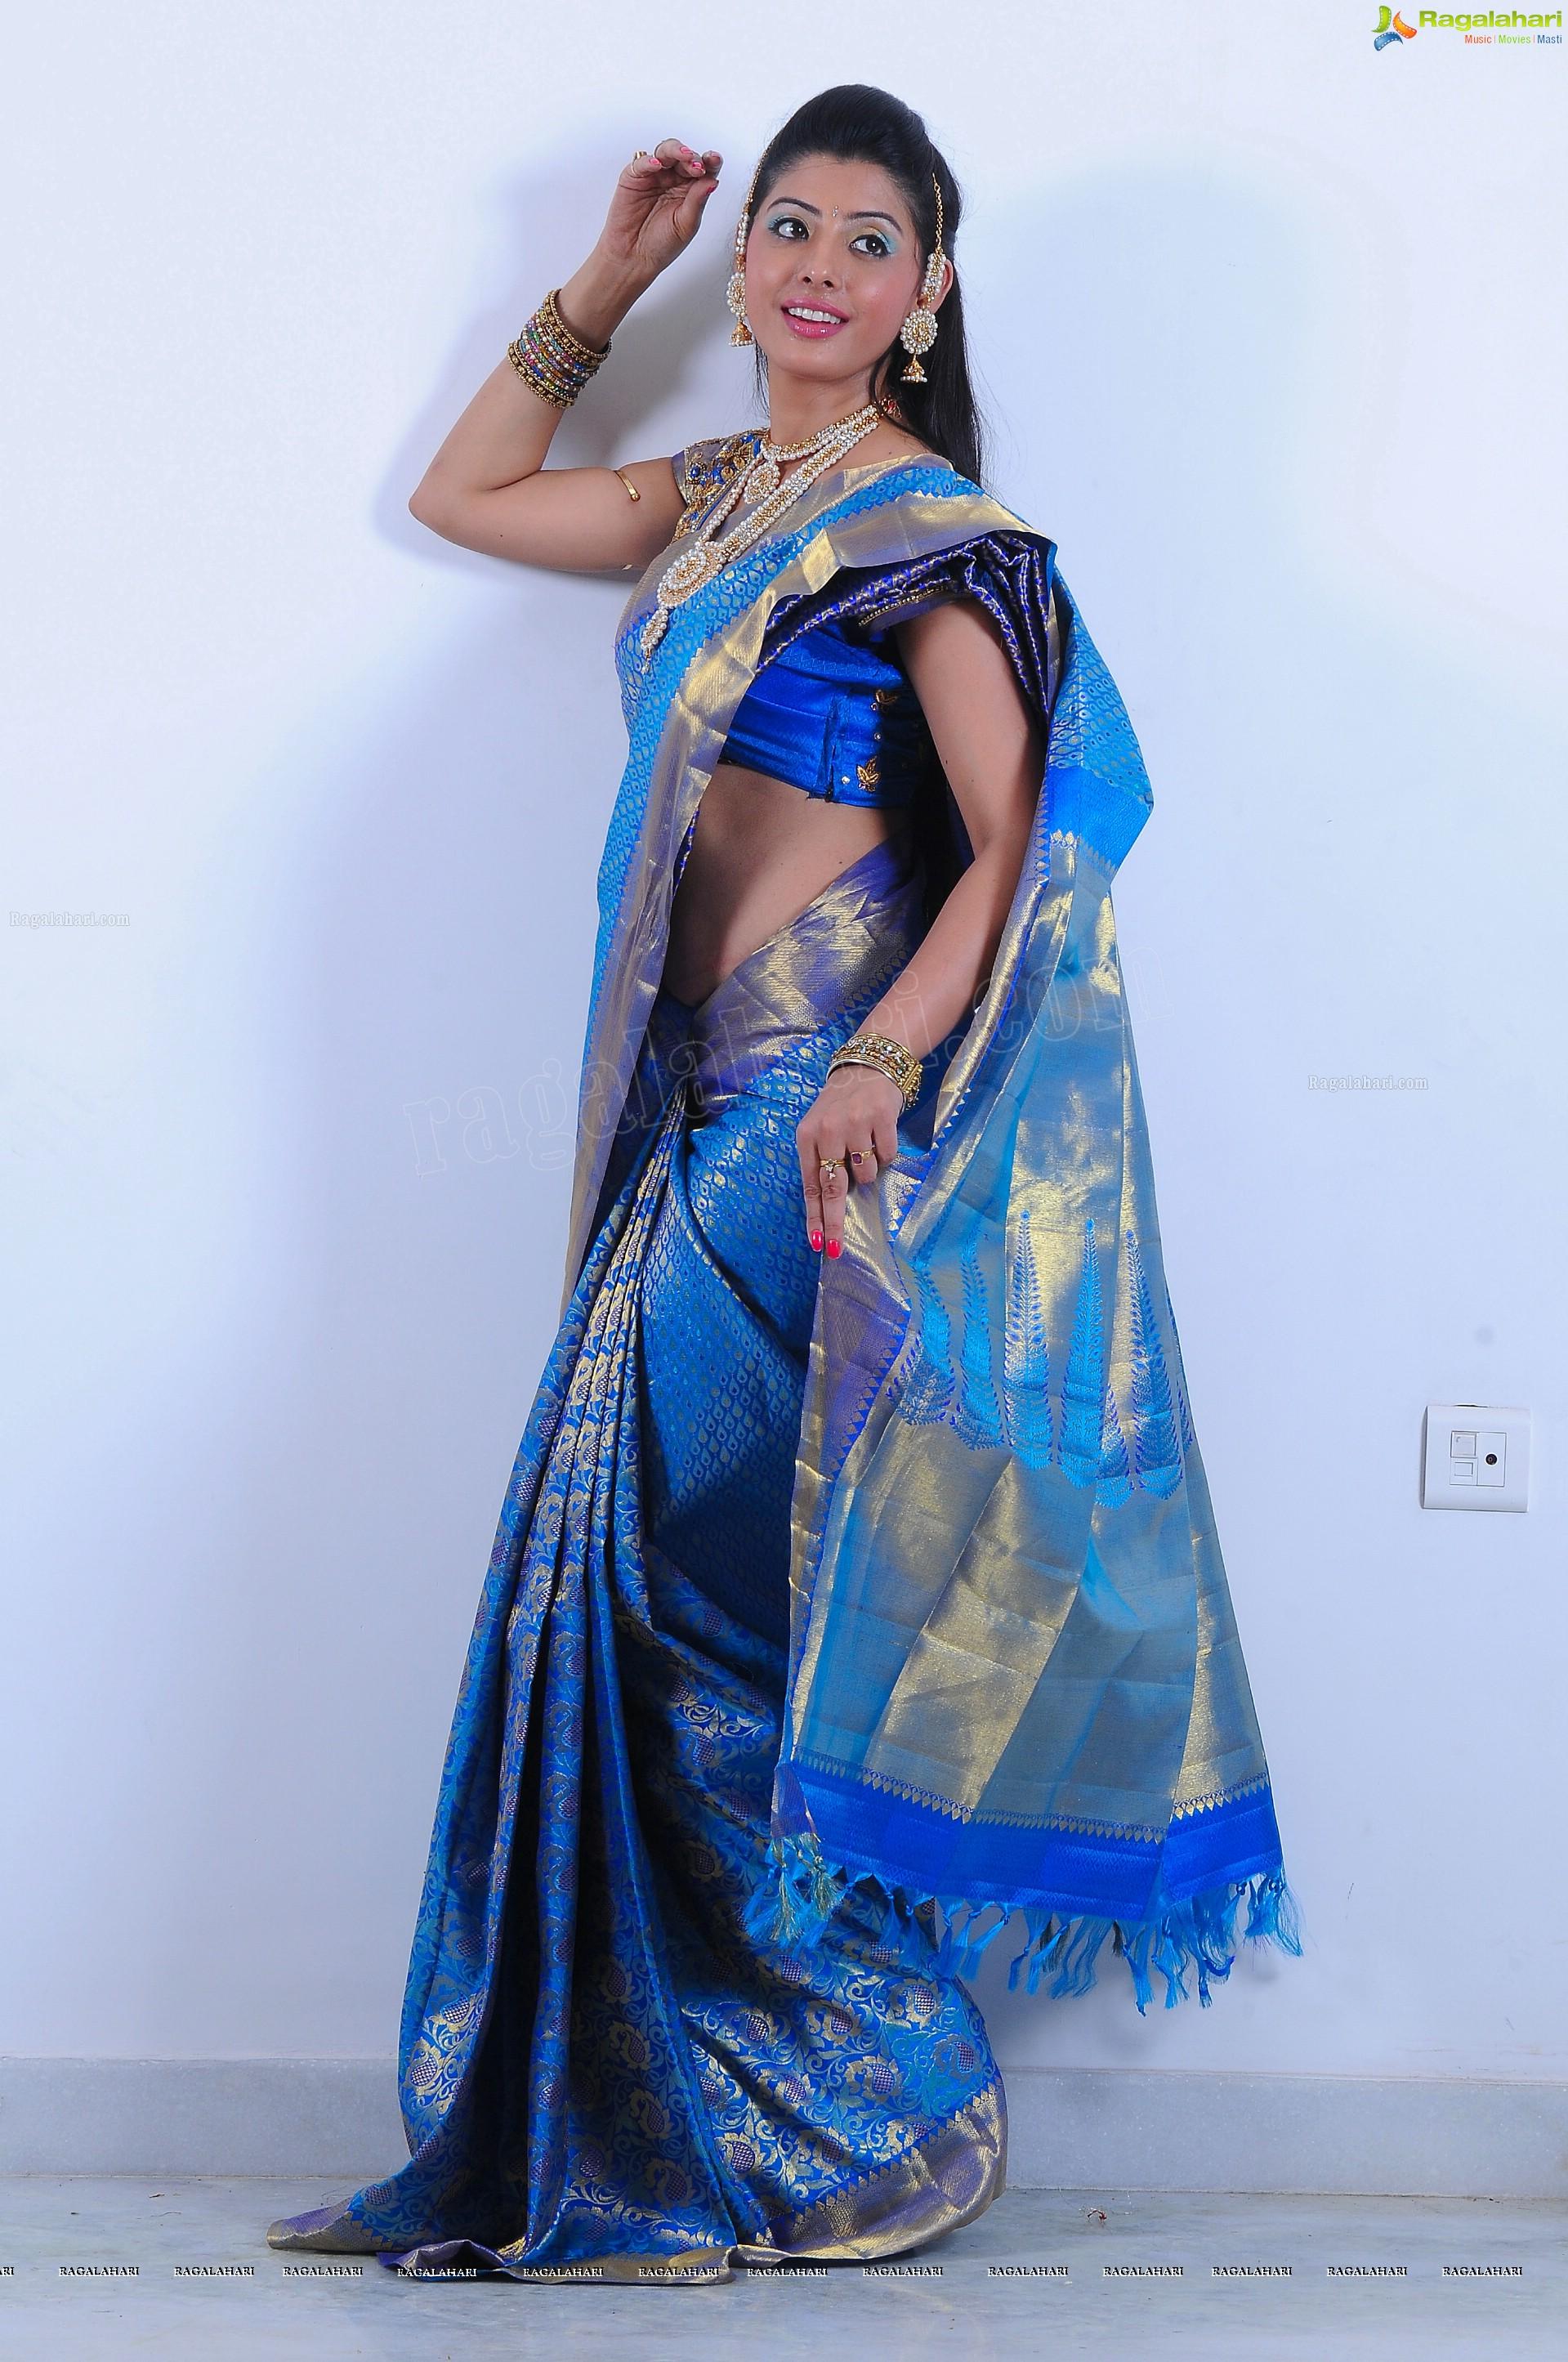 Telugu Heros Hd Wallpapers Download The Best Hd Wallpaper